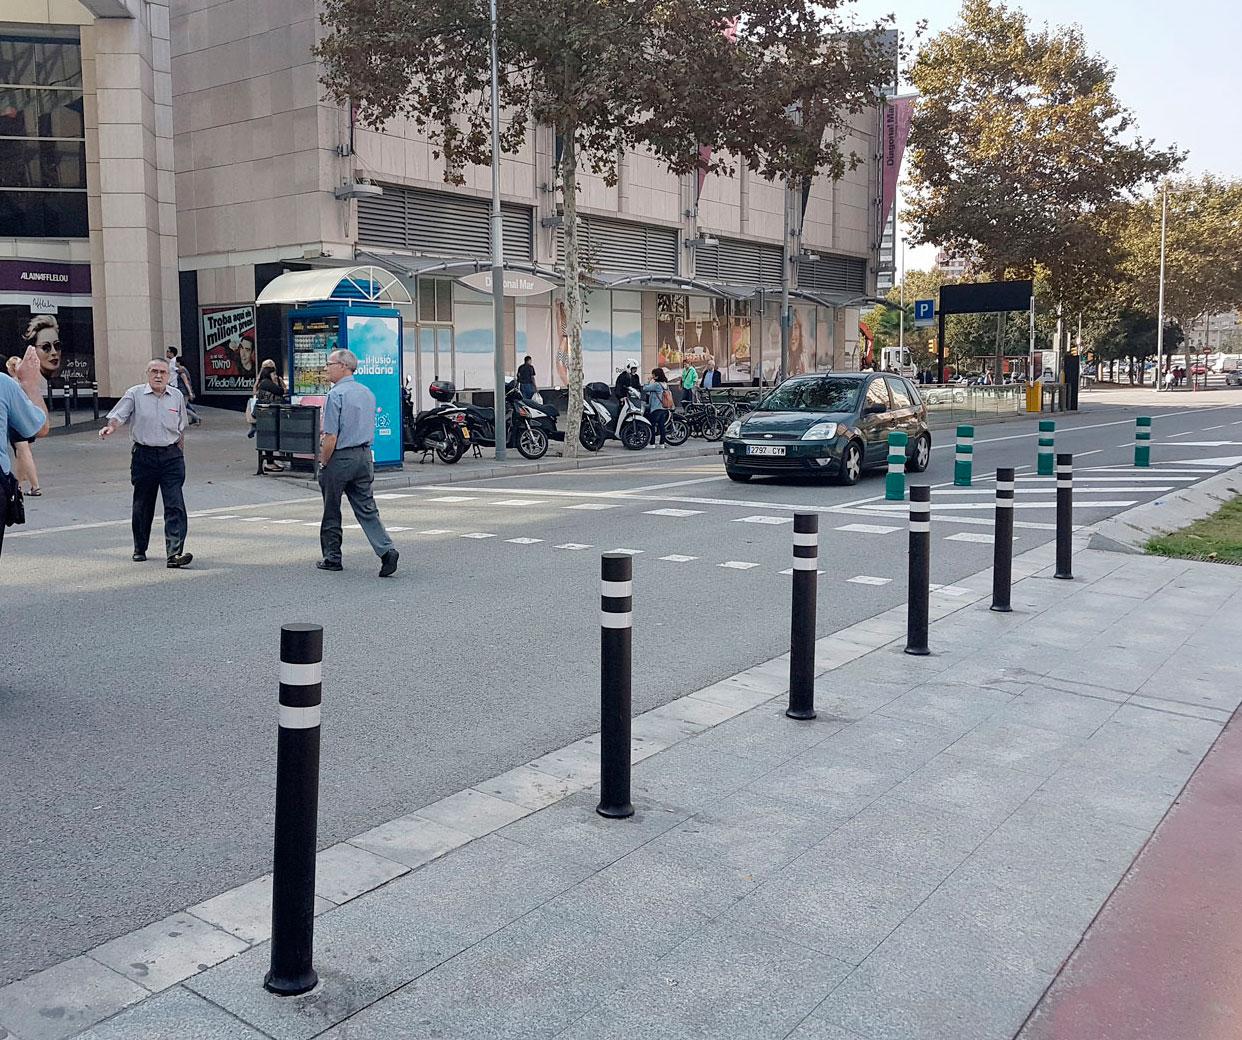 Bolardos A-Flex DT flexibles instalados Diagonal Mar Barcelona